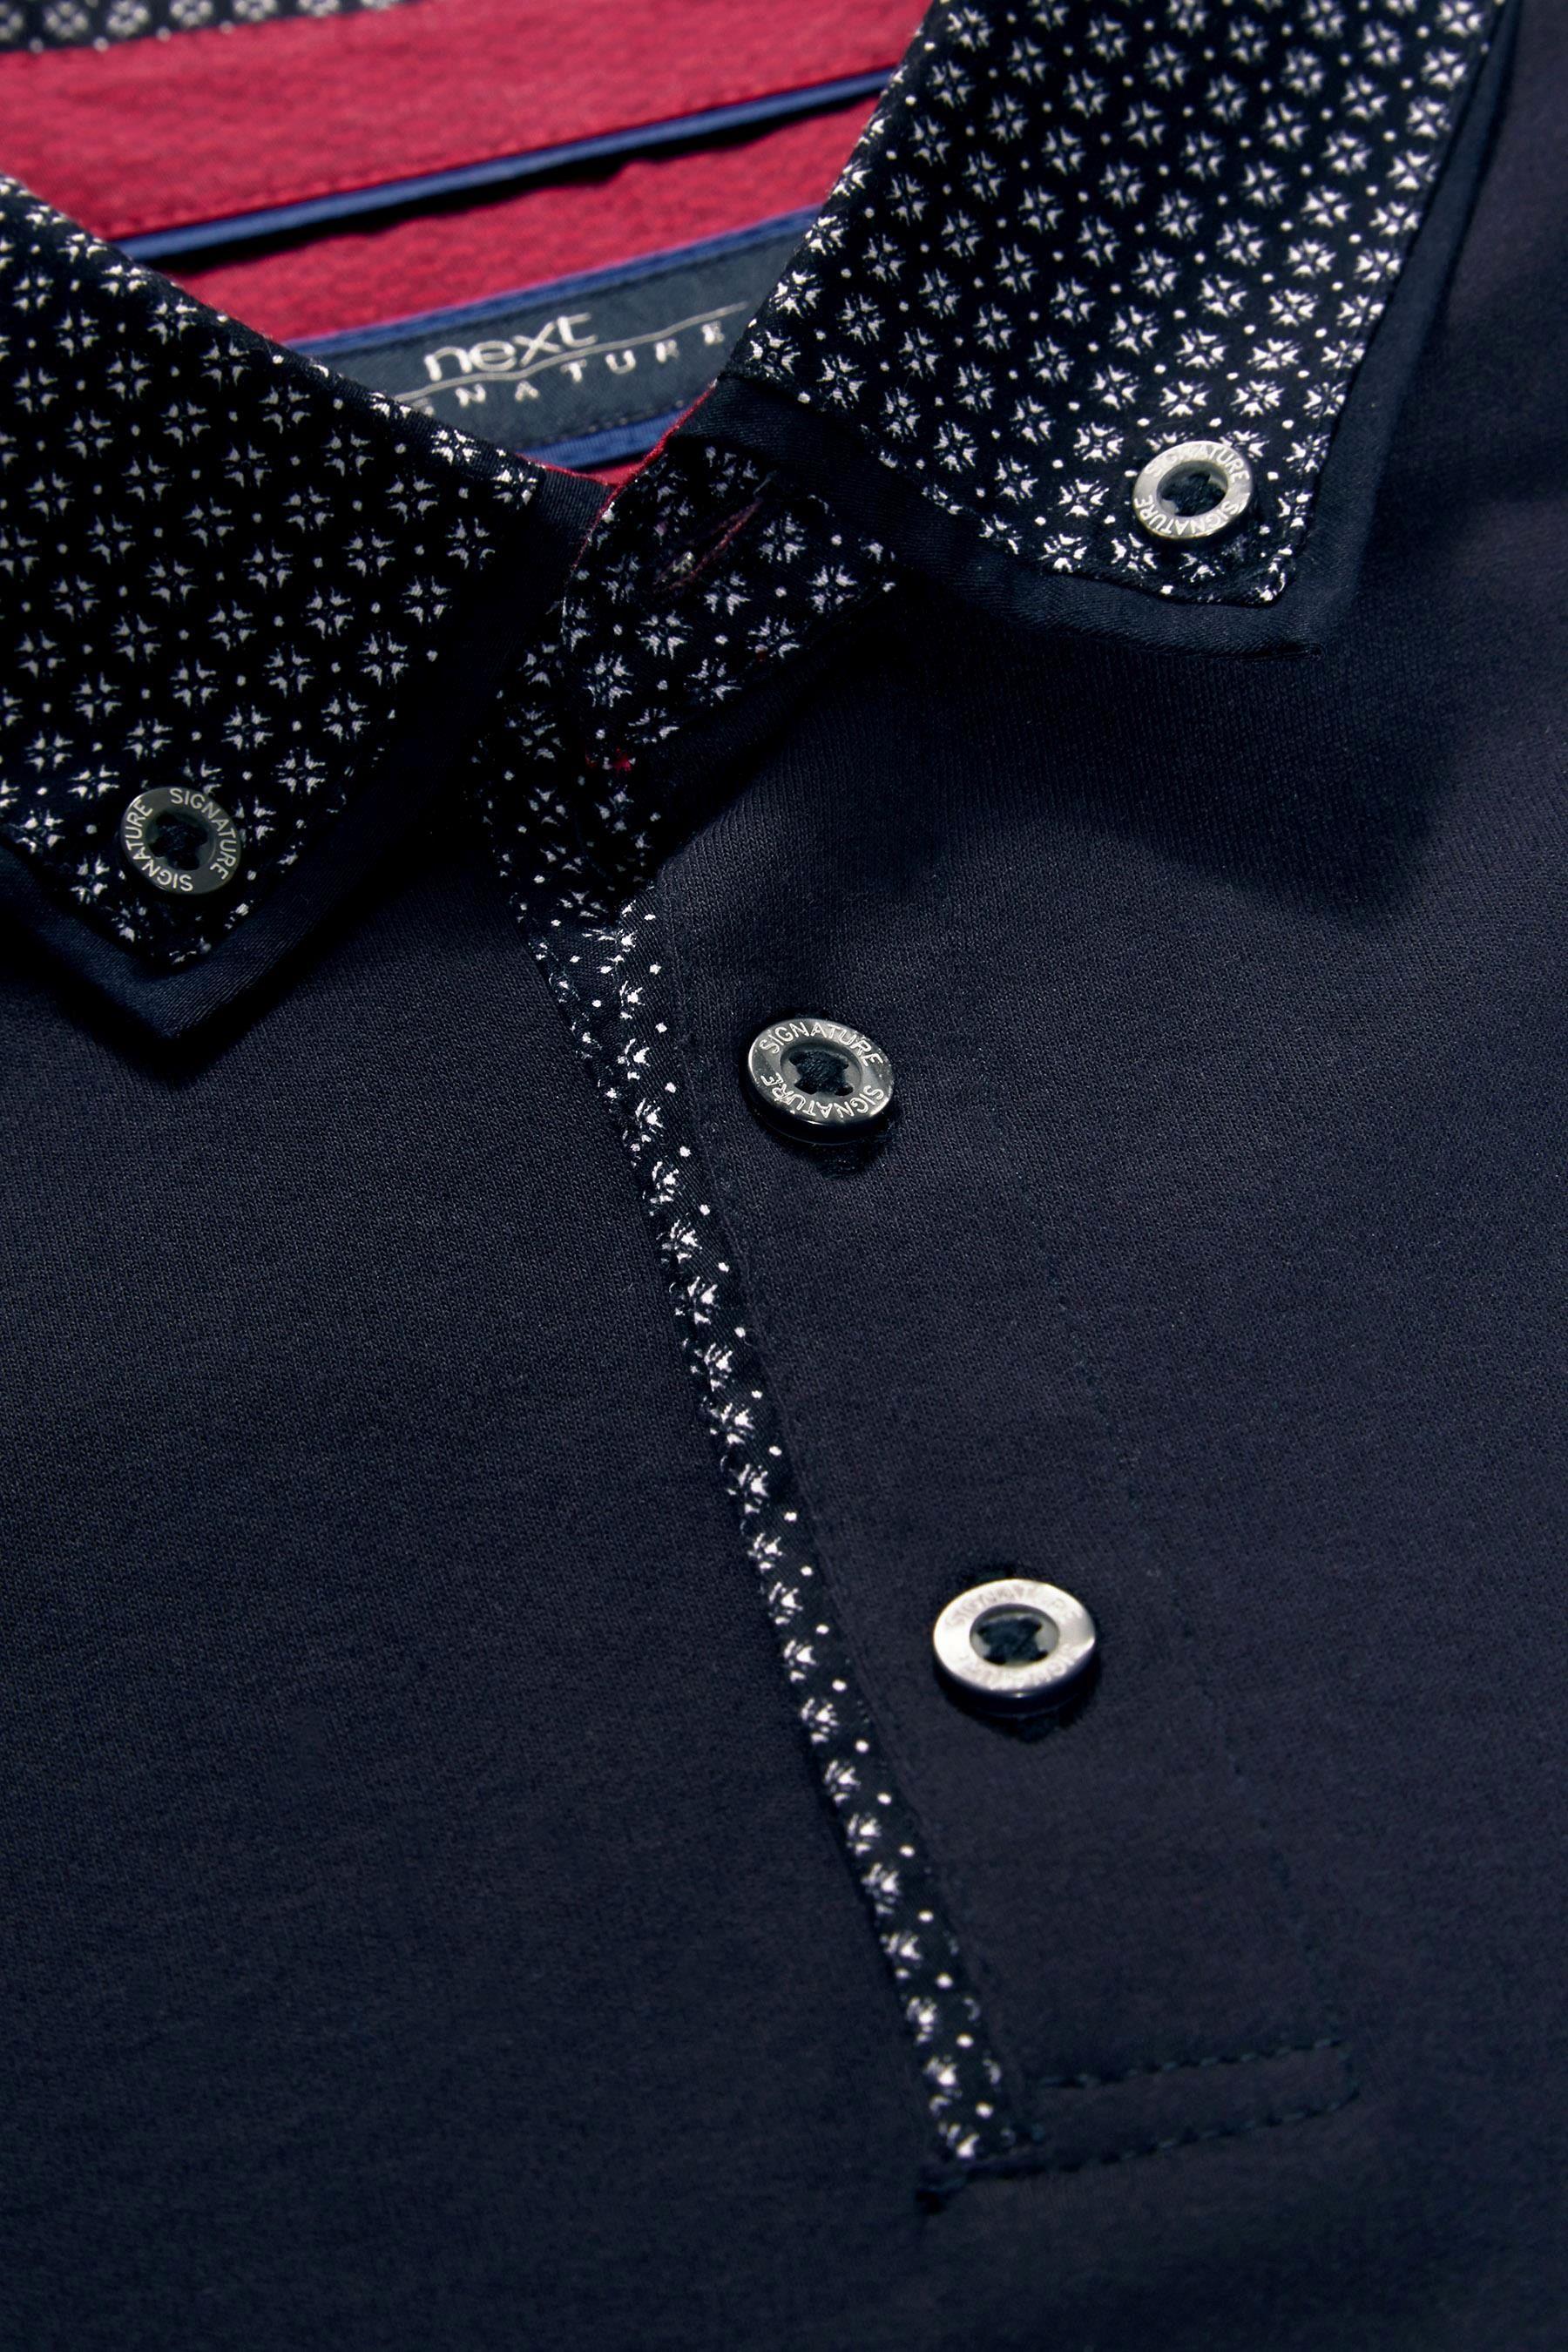 Shirt design online uk - Buy Signature Poloshirt From The Next Uk Online Shop